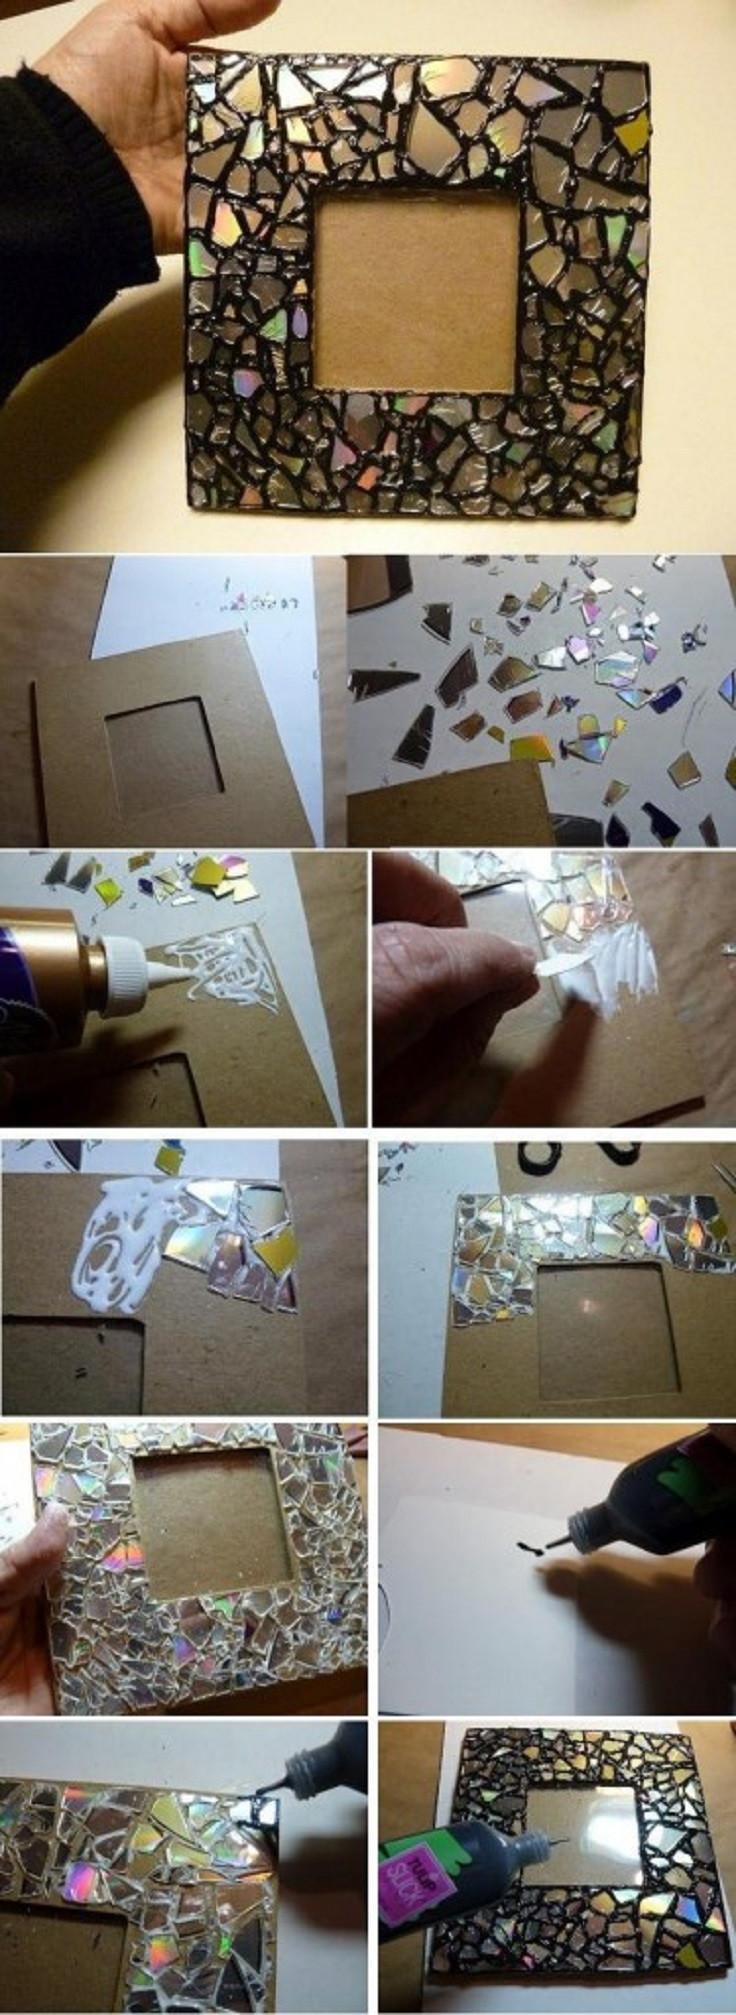 Diy Home Ideas  Here Are 25 Easy Handmade Home Craft Ideas Part 1